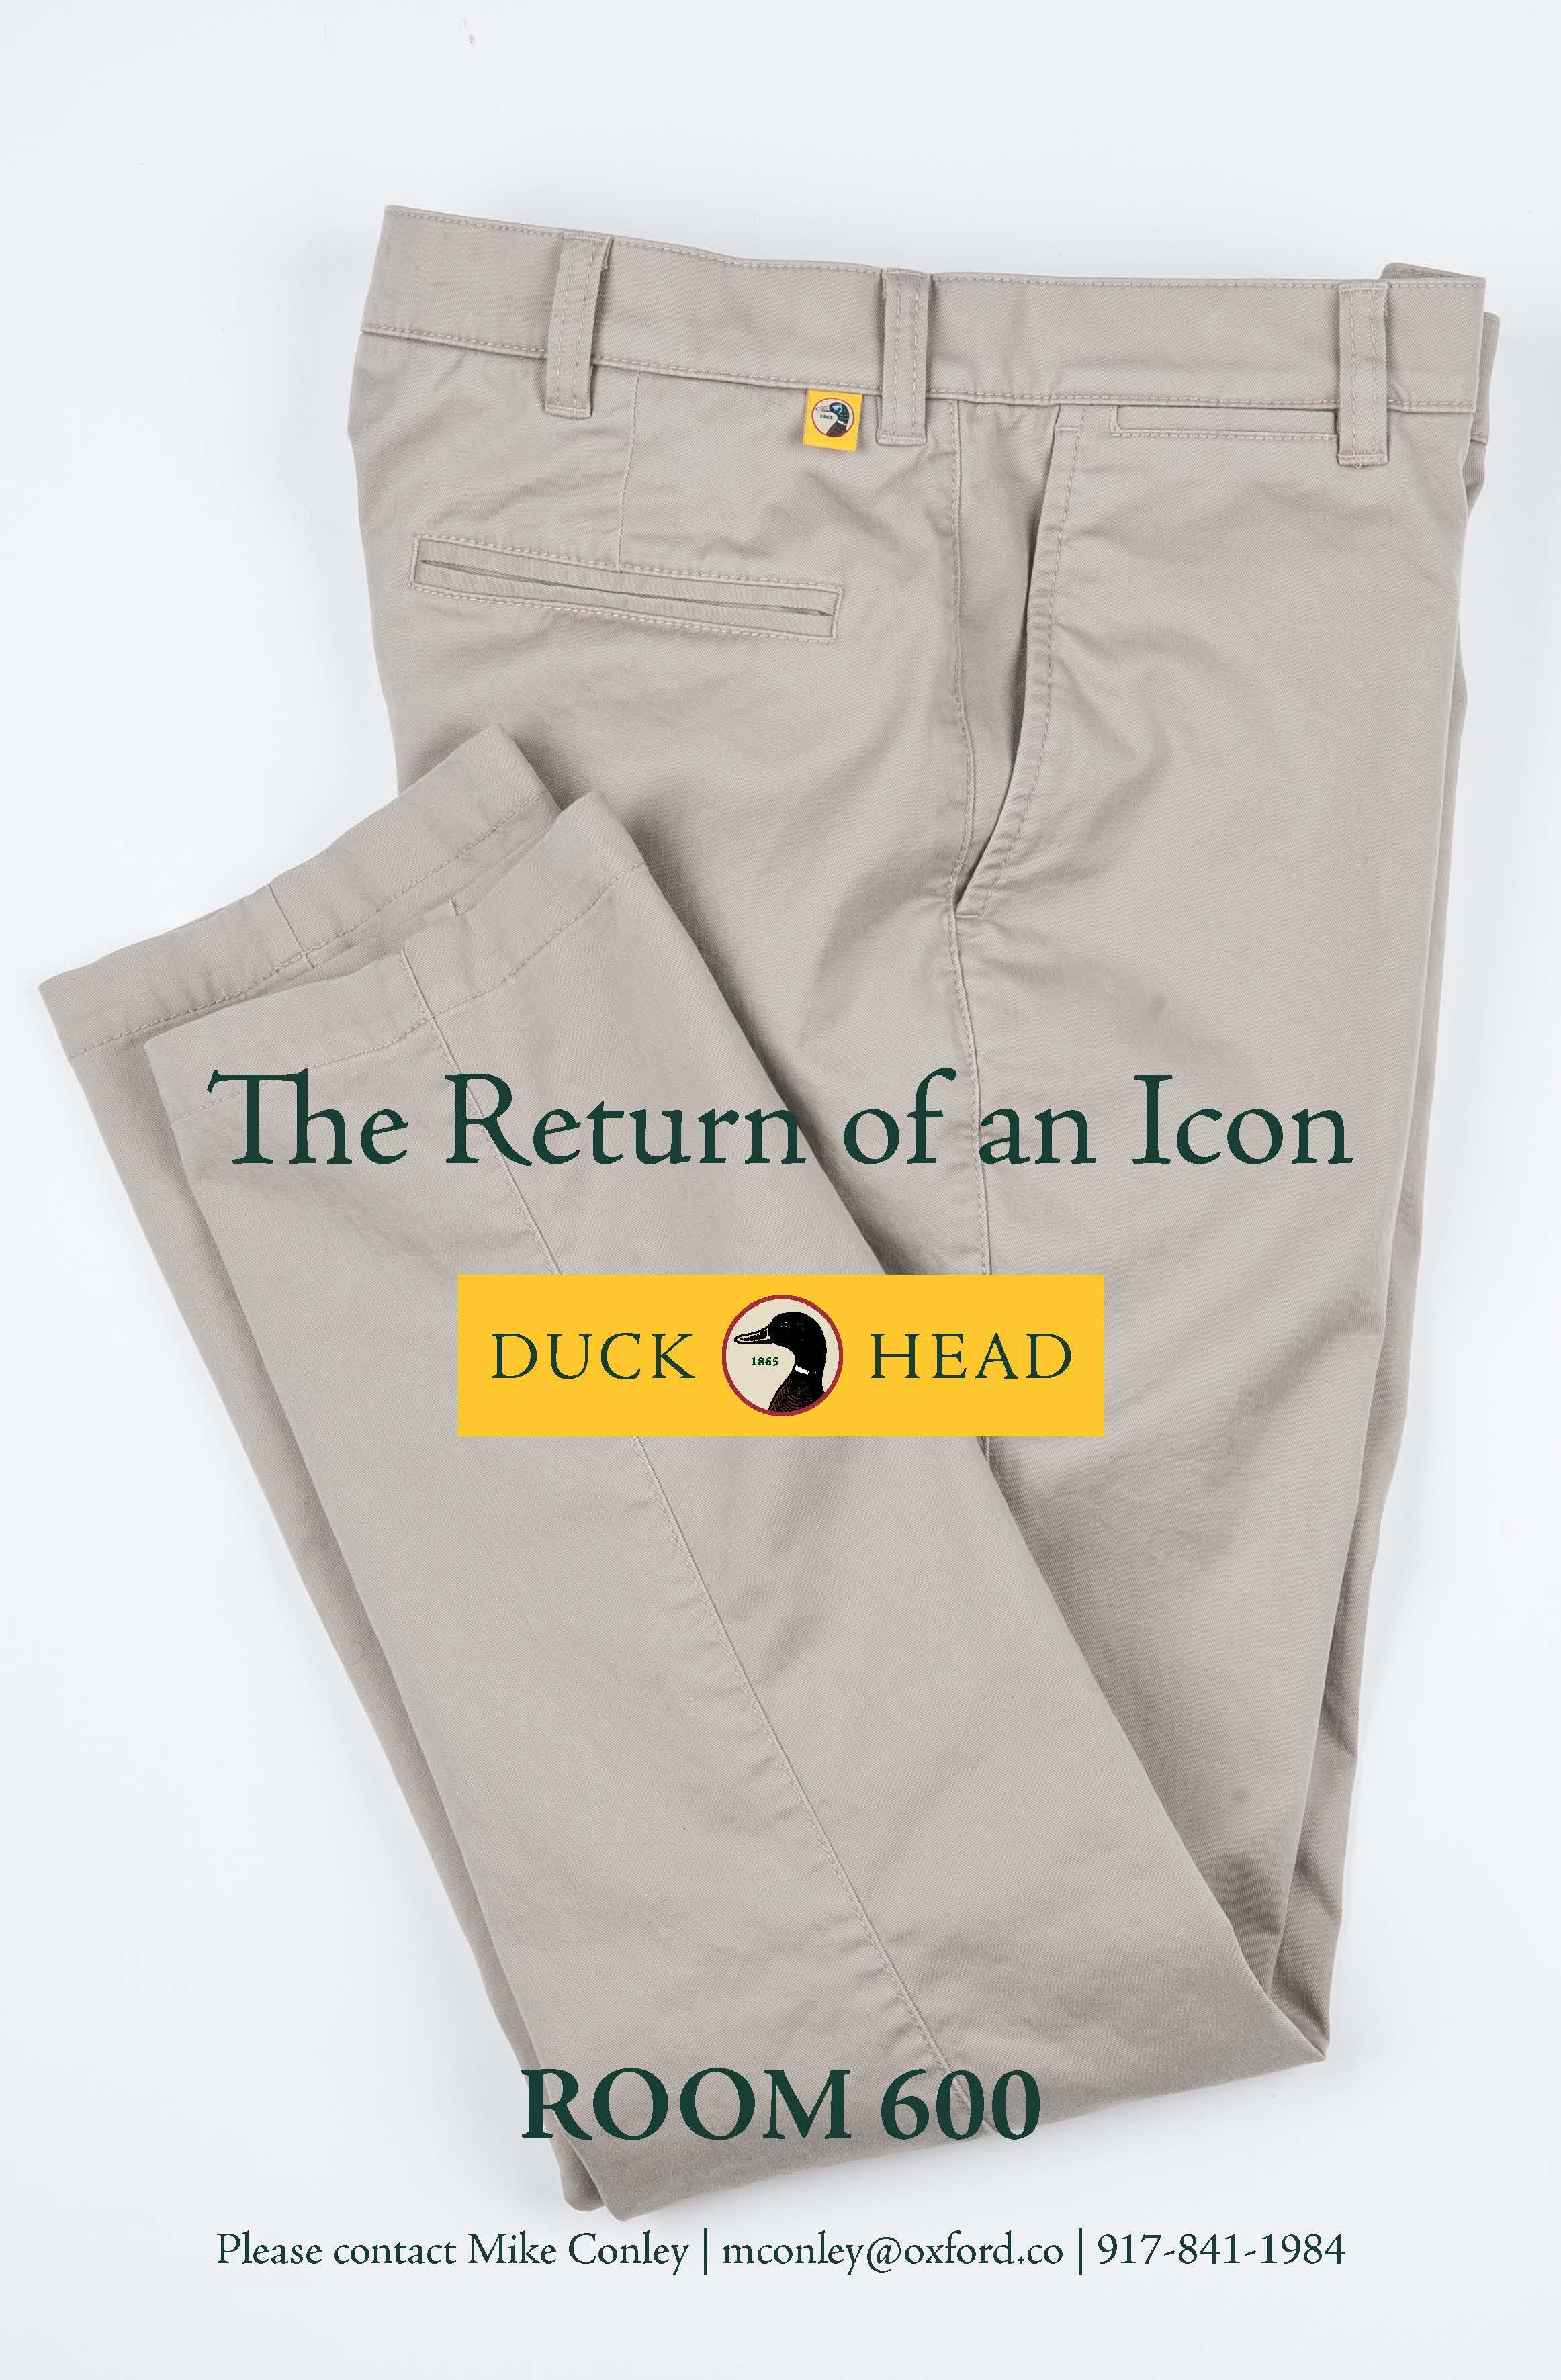 DUCK HEAD Print Directory Ad F19 - DH